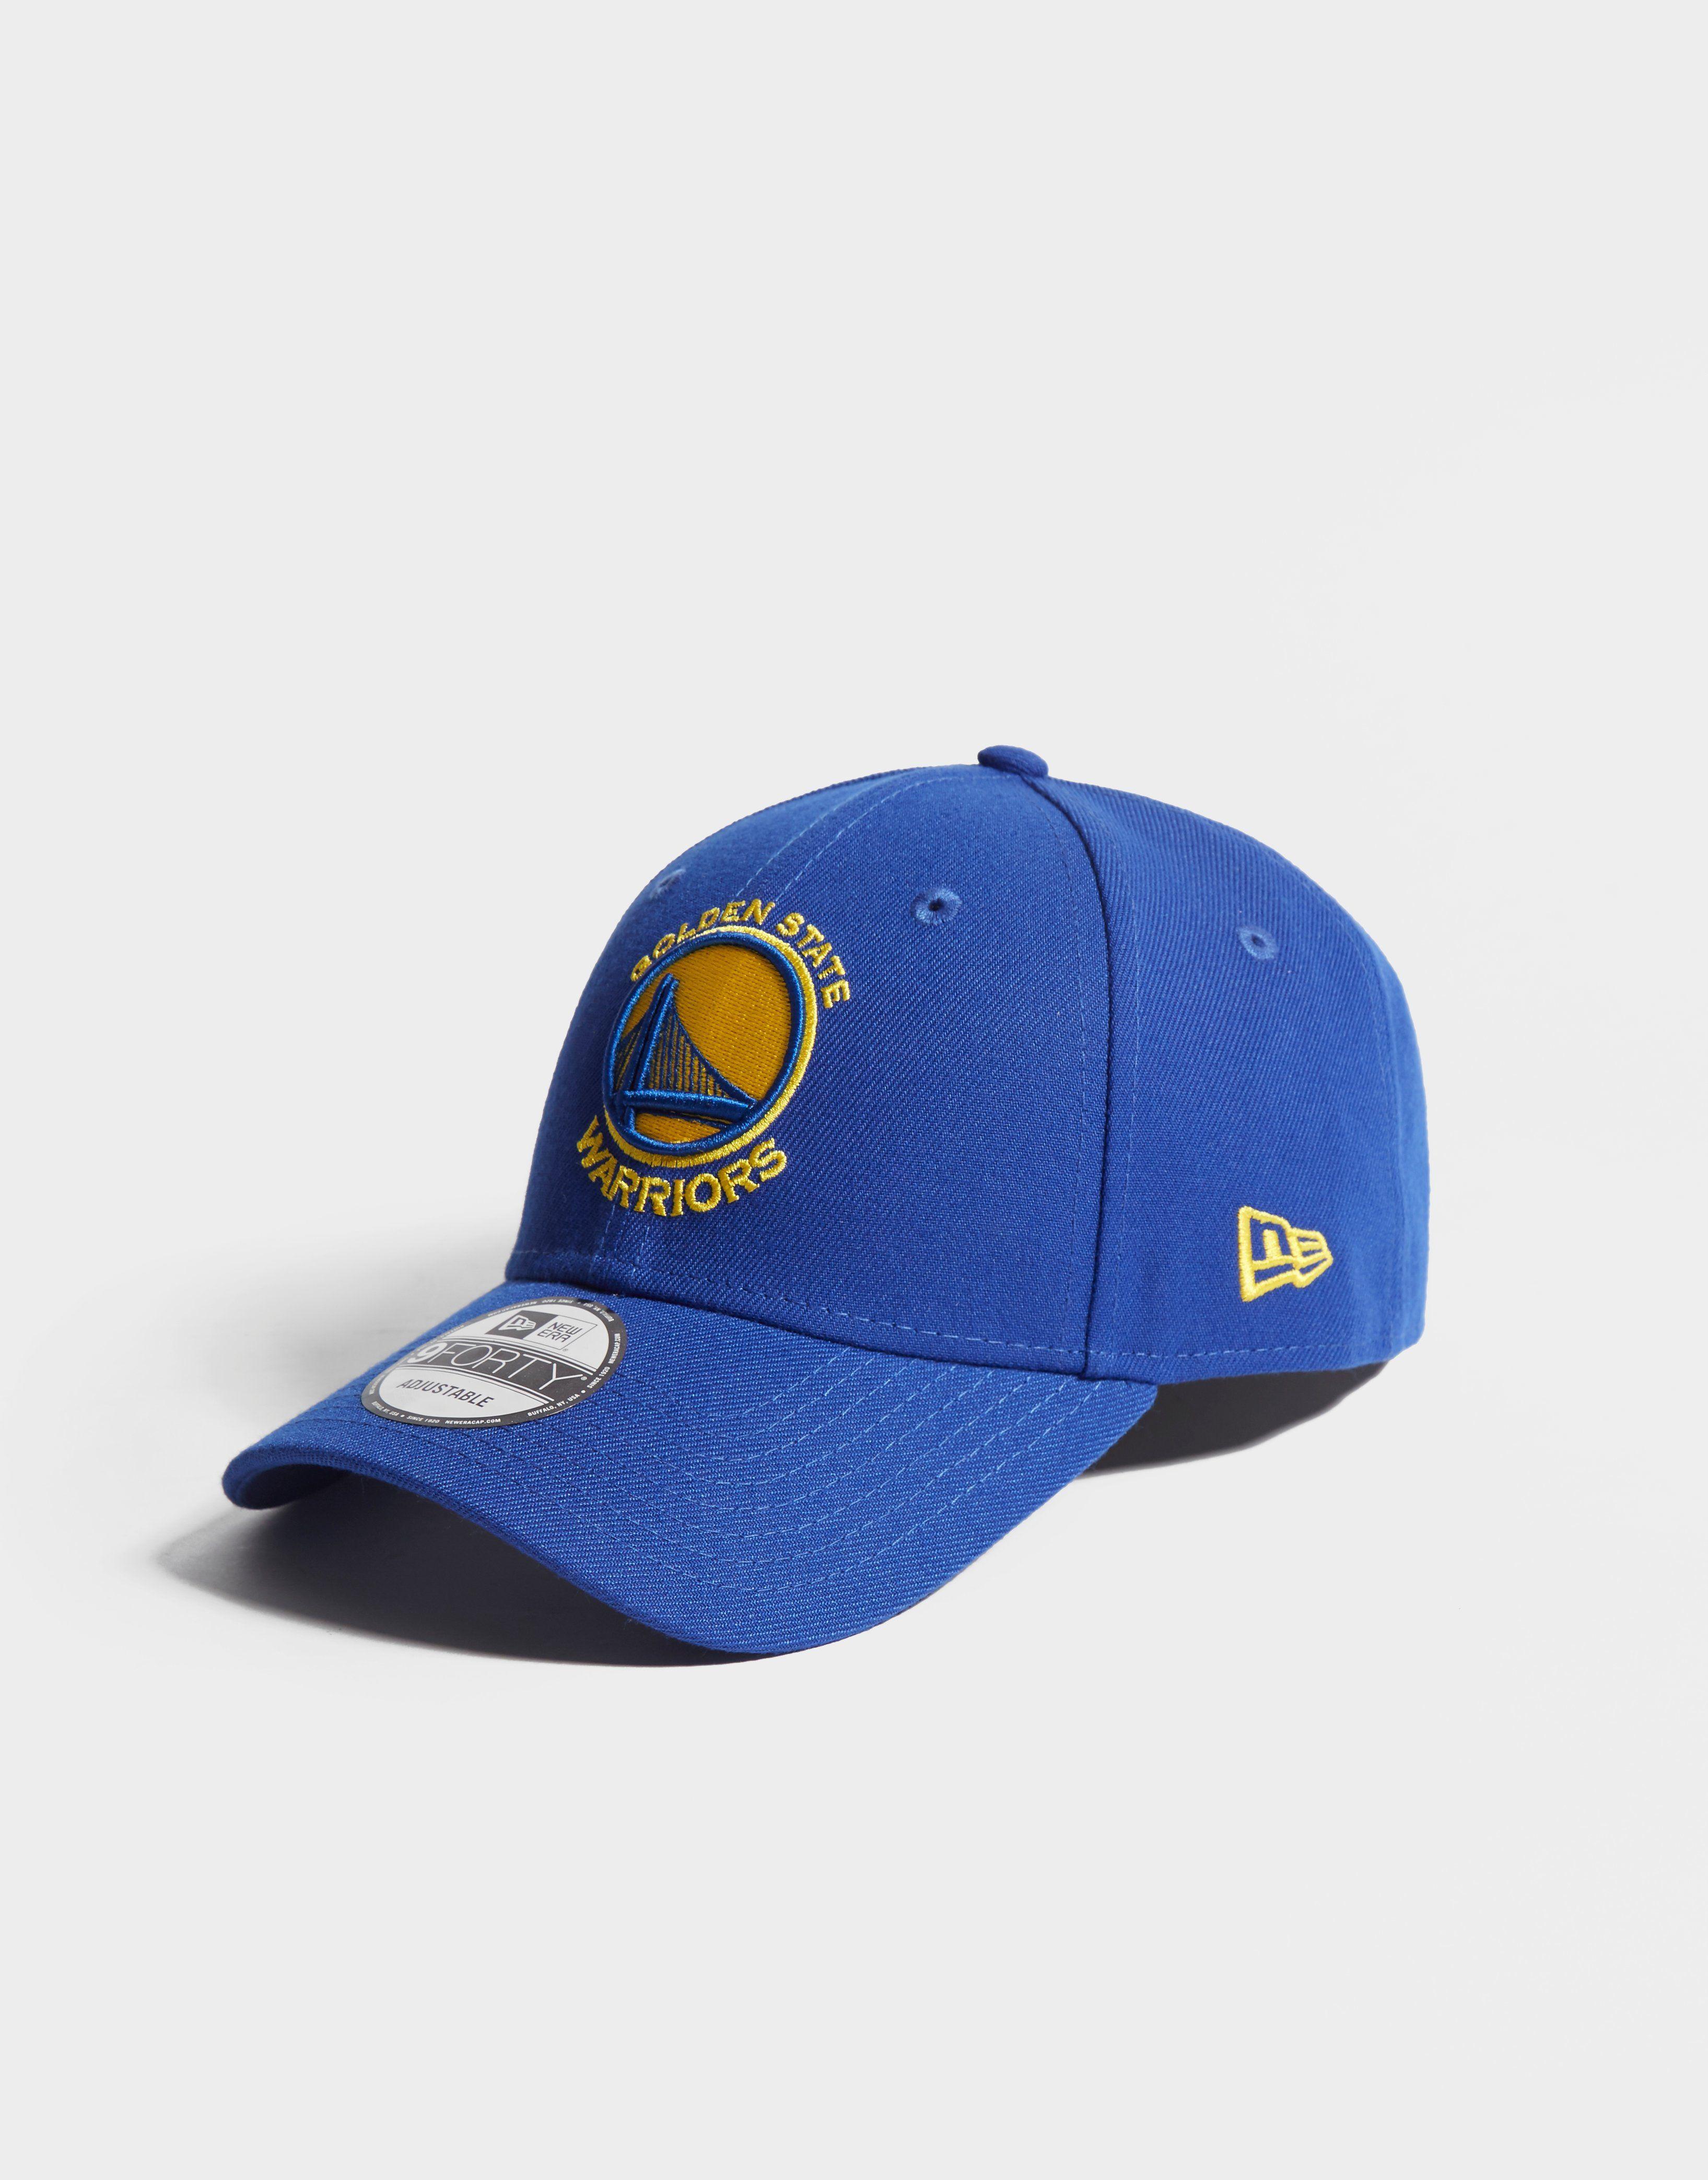 232c3f260ff5af New Era NBA Golden State Warriors 9FORTY Cap | JD Sports